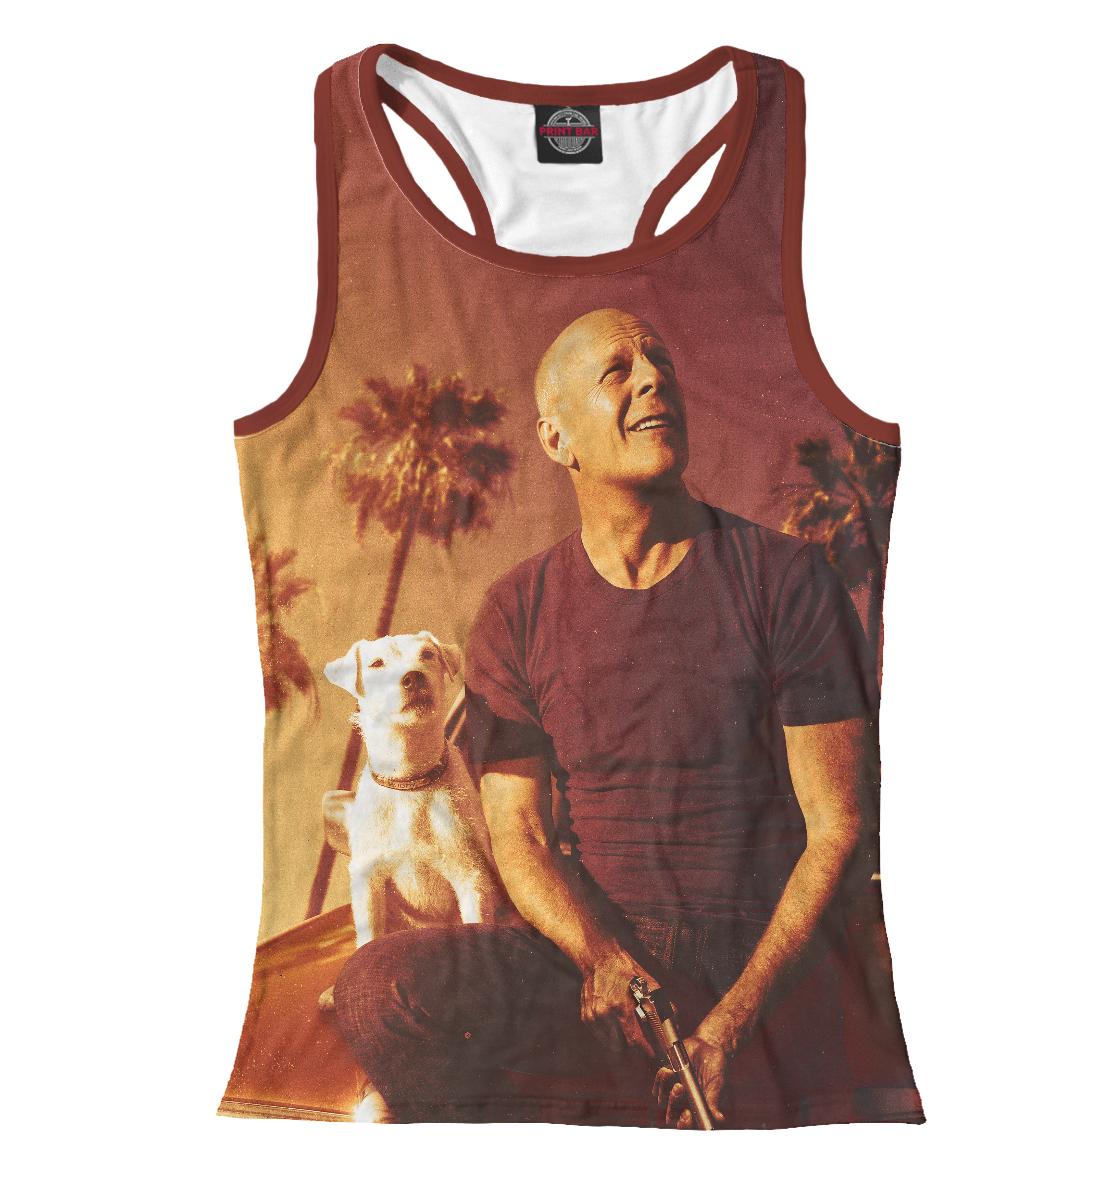 Купить Его собачье дело, Printbar, Майки борцовки, KNO-826234-mayb-1